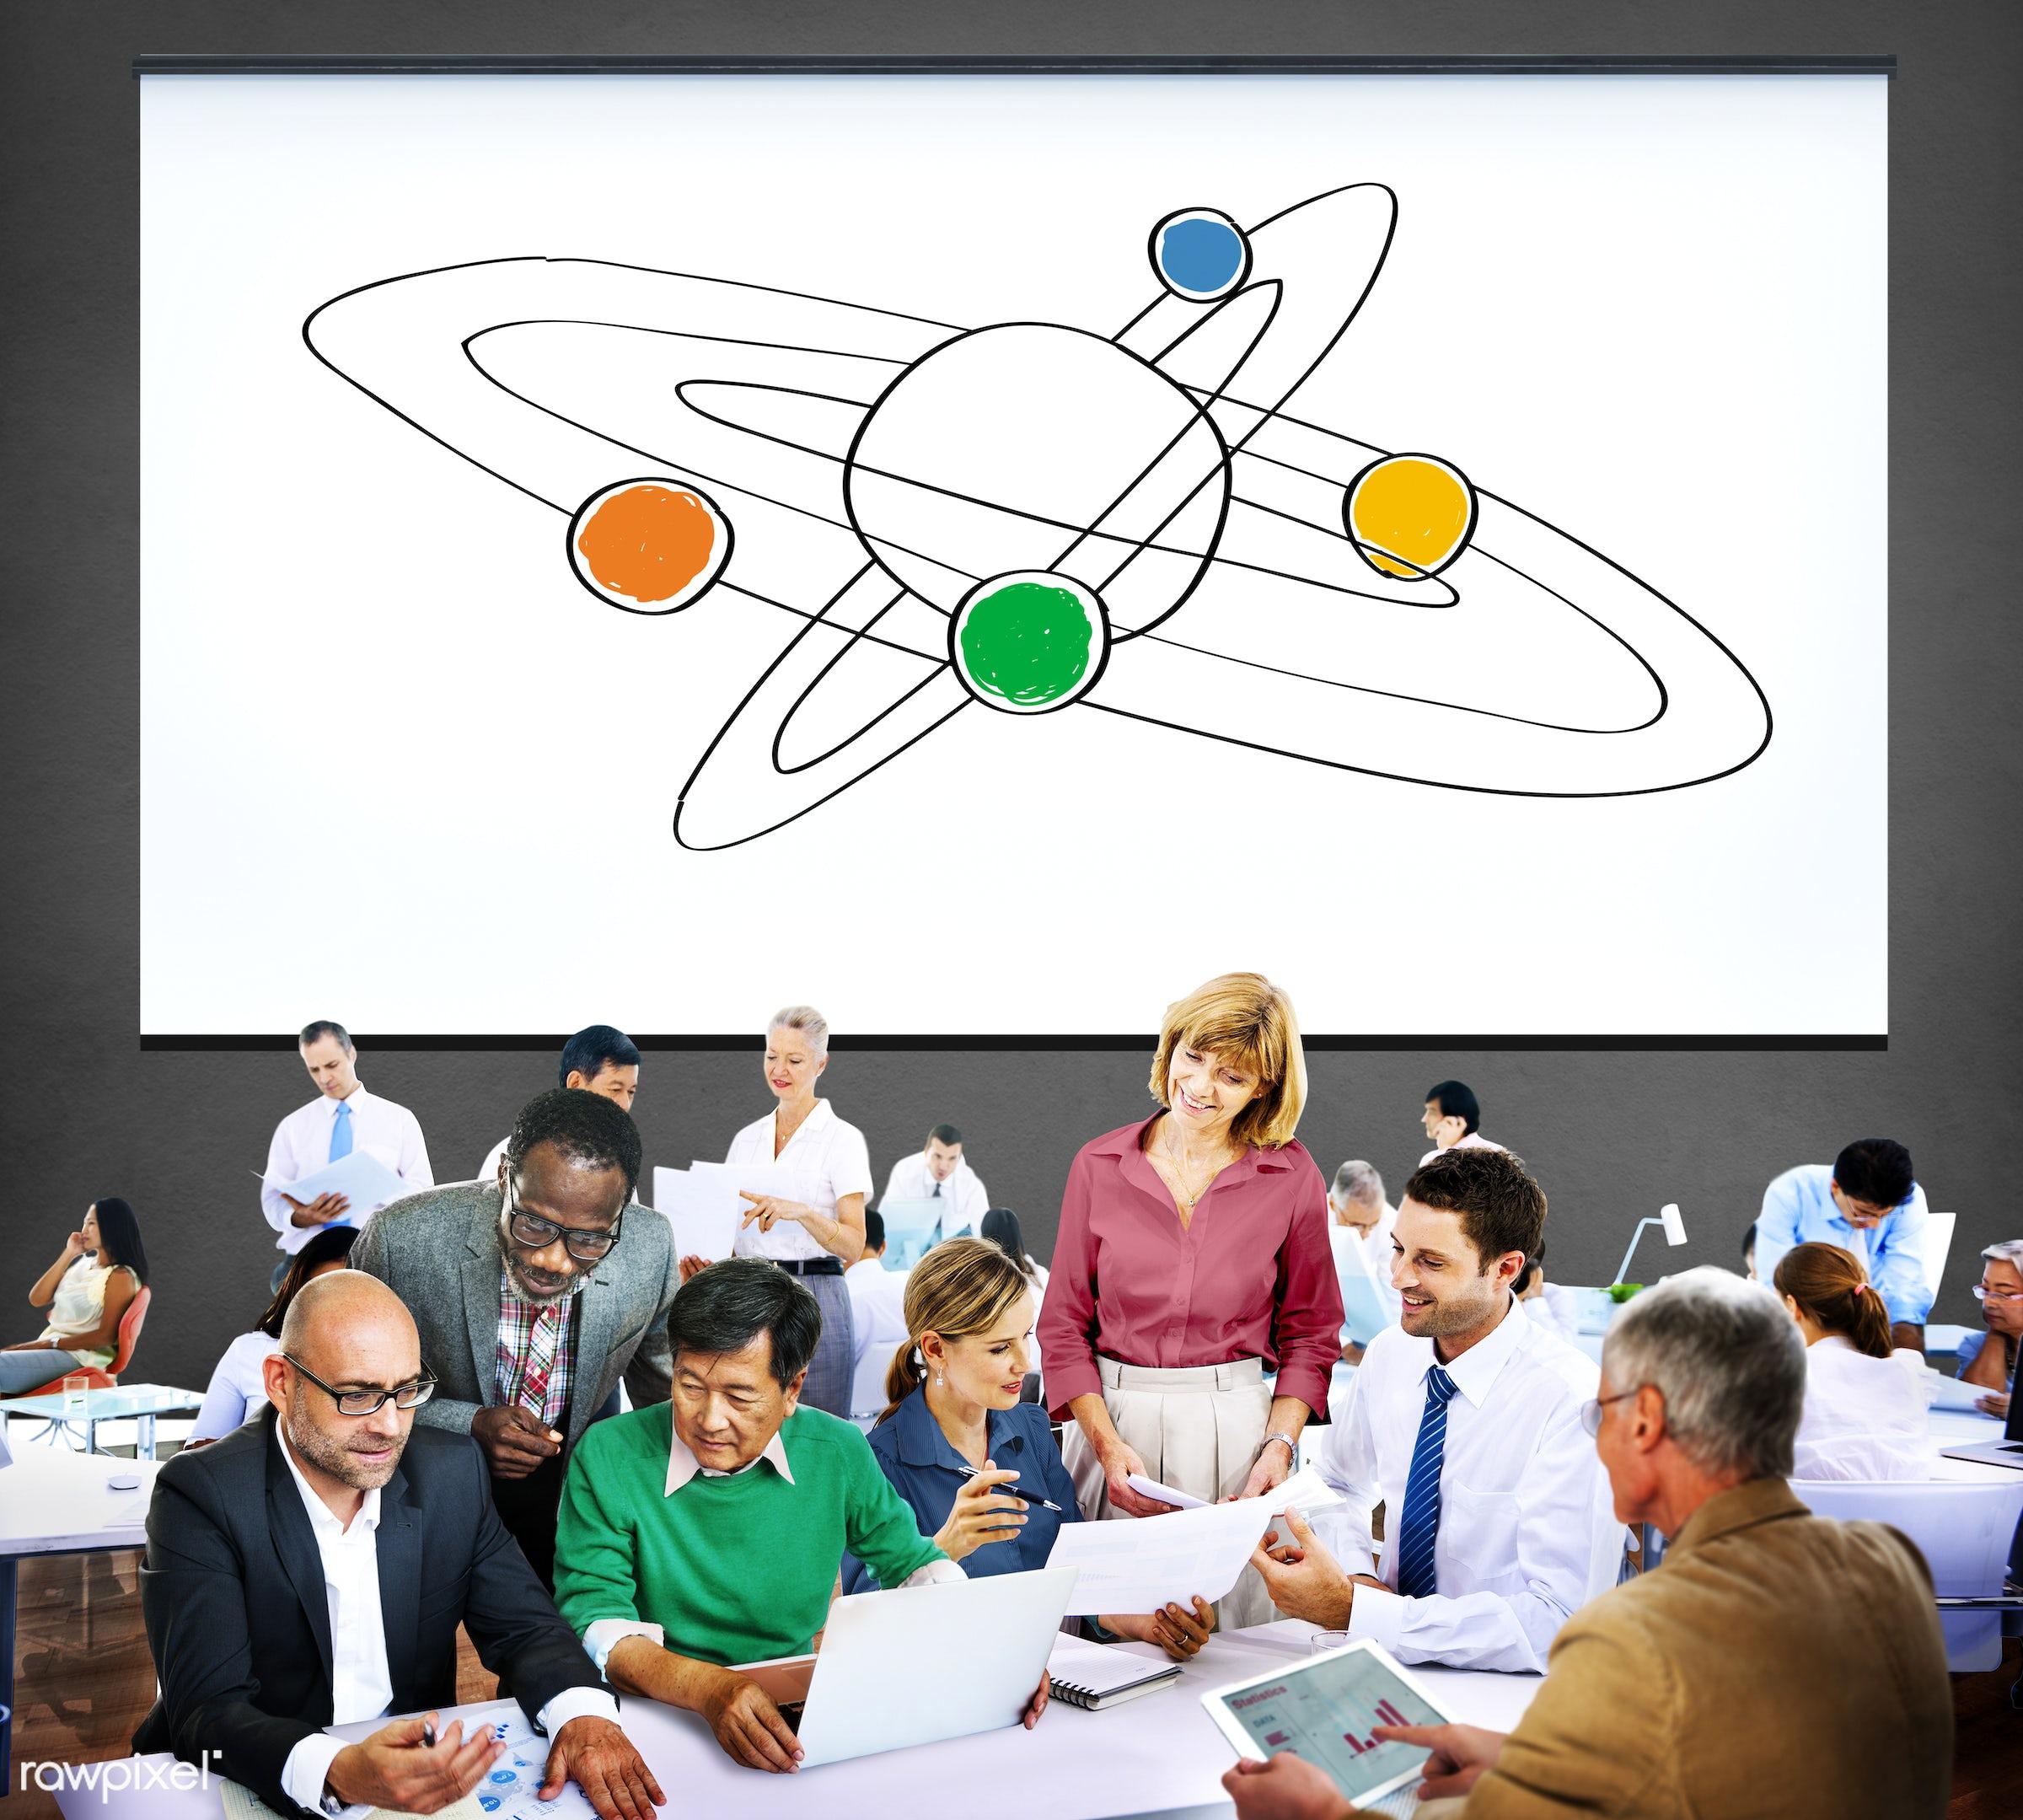 analysis, boss, business, business people, businessmen, businesswomen, busy, center, central, communication, conversation,...